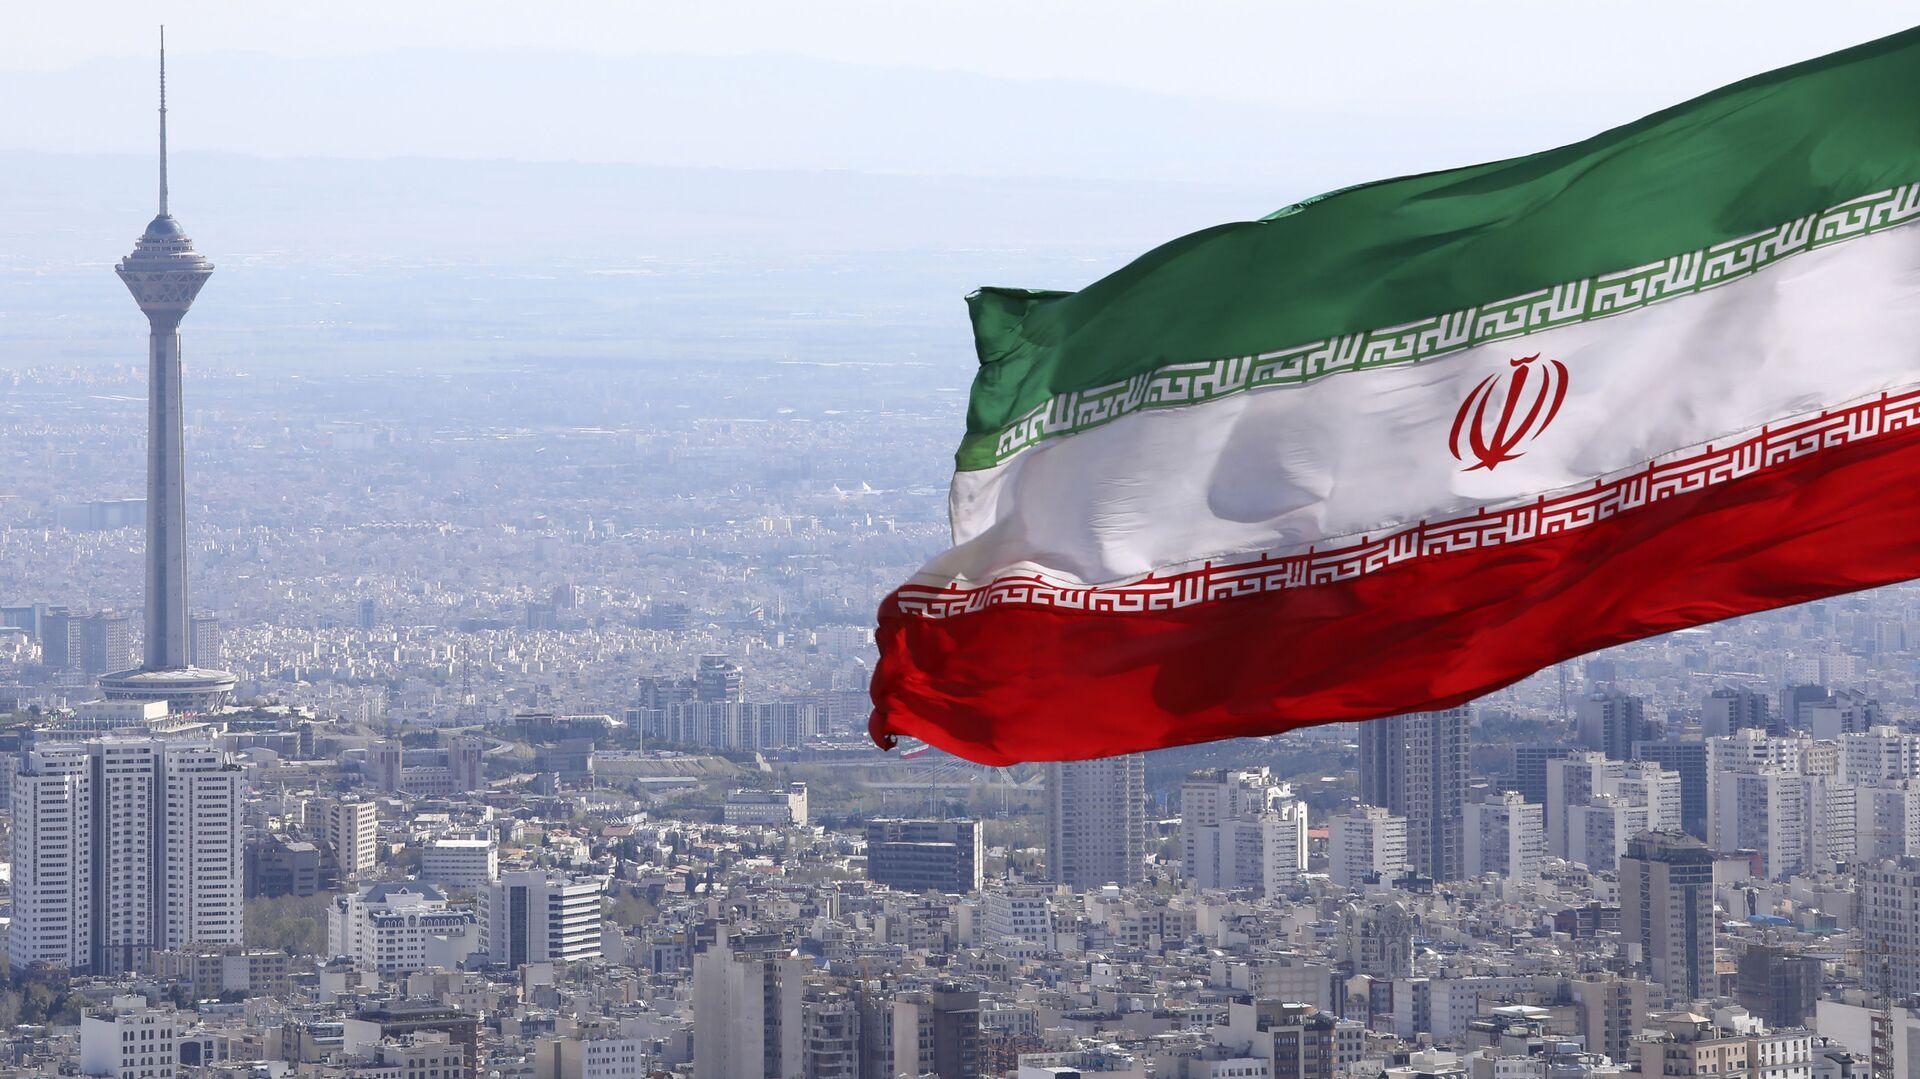 Bandiera iraniana, Iran, Teheran - Sputnik Italia, 1920, 12.04.2021